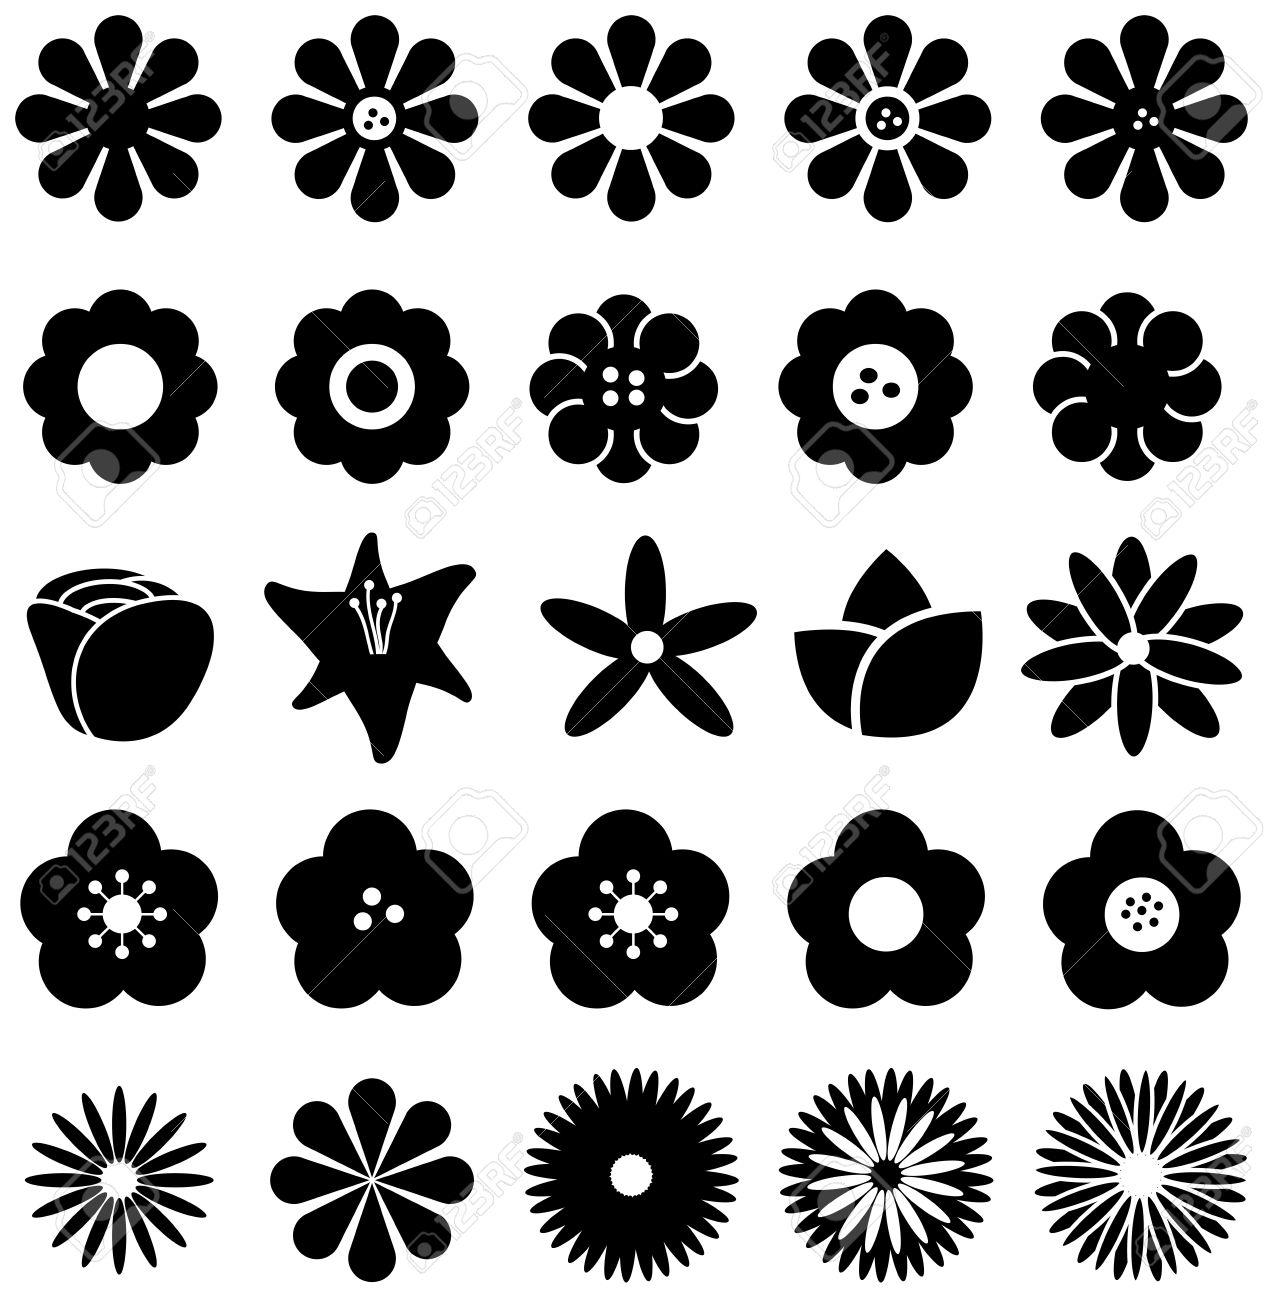 28,969 Sunflower Cliparts, Stock Vector And Royalty Free Sunflower ... for Clipart Sunflower Black And White  131fsj